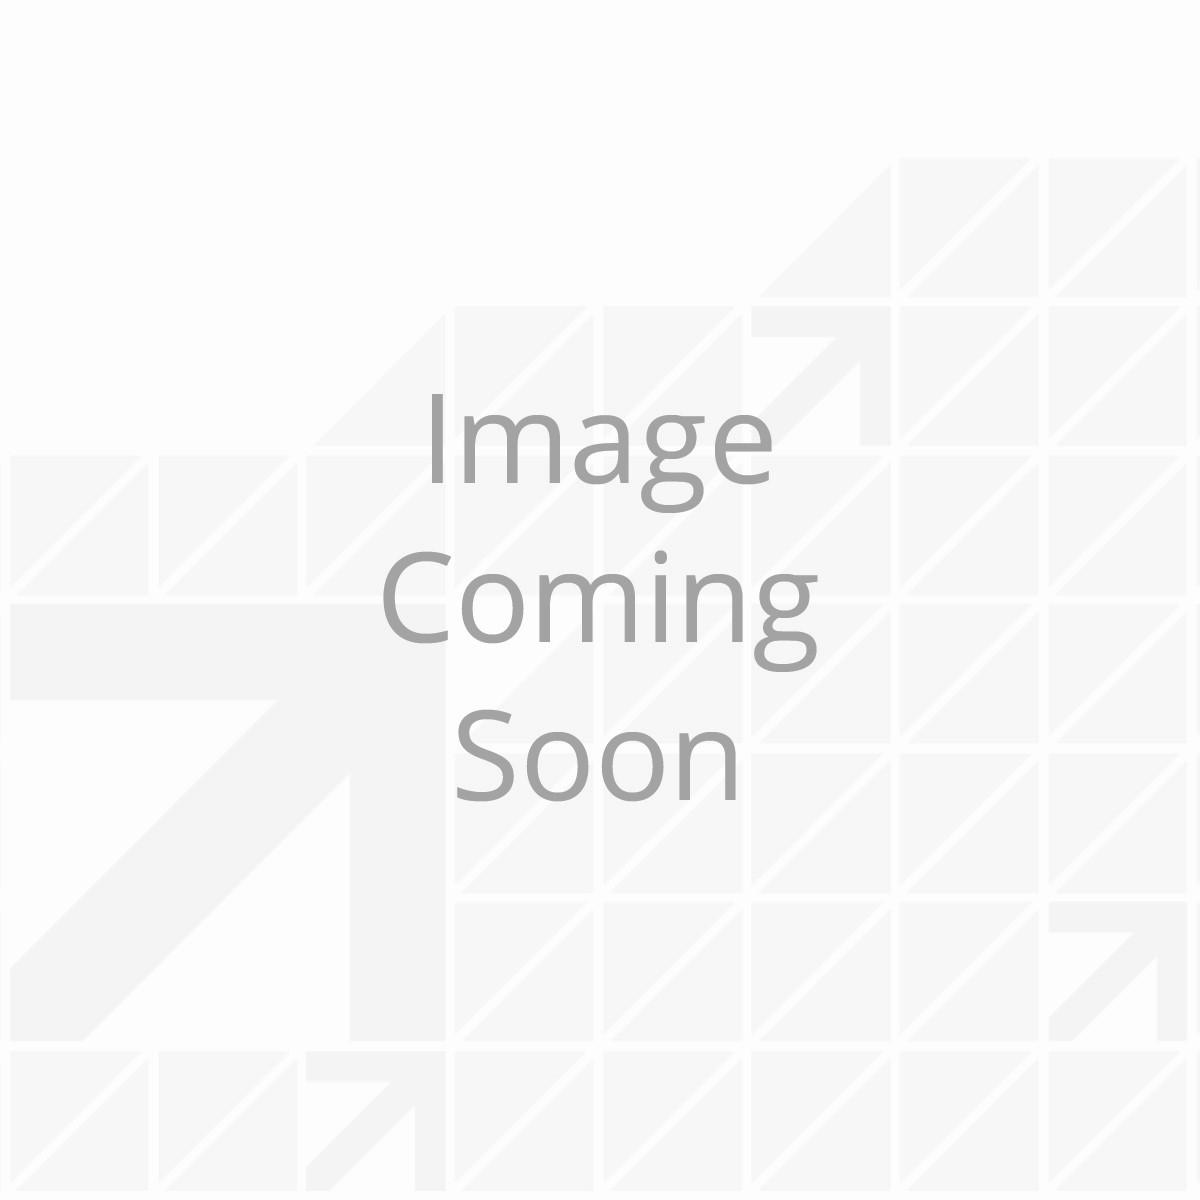 171133_AP-Kit_001